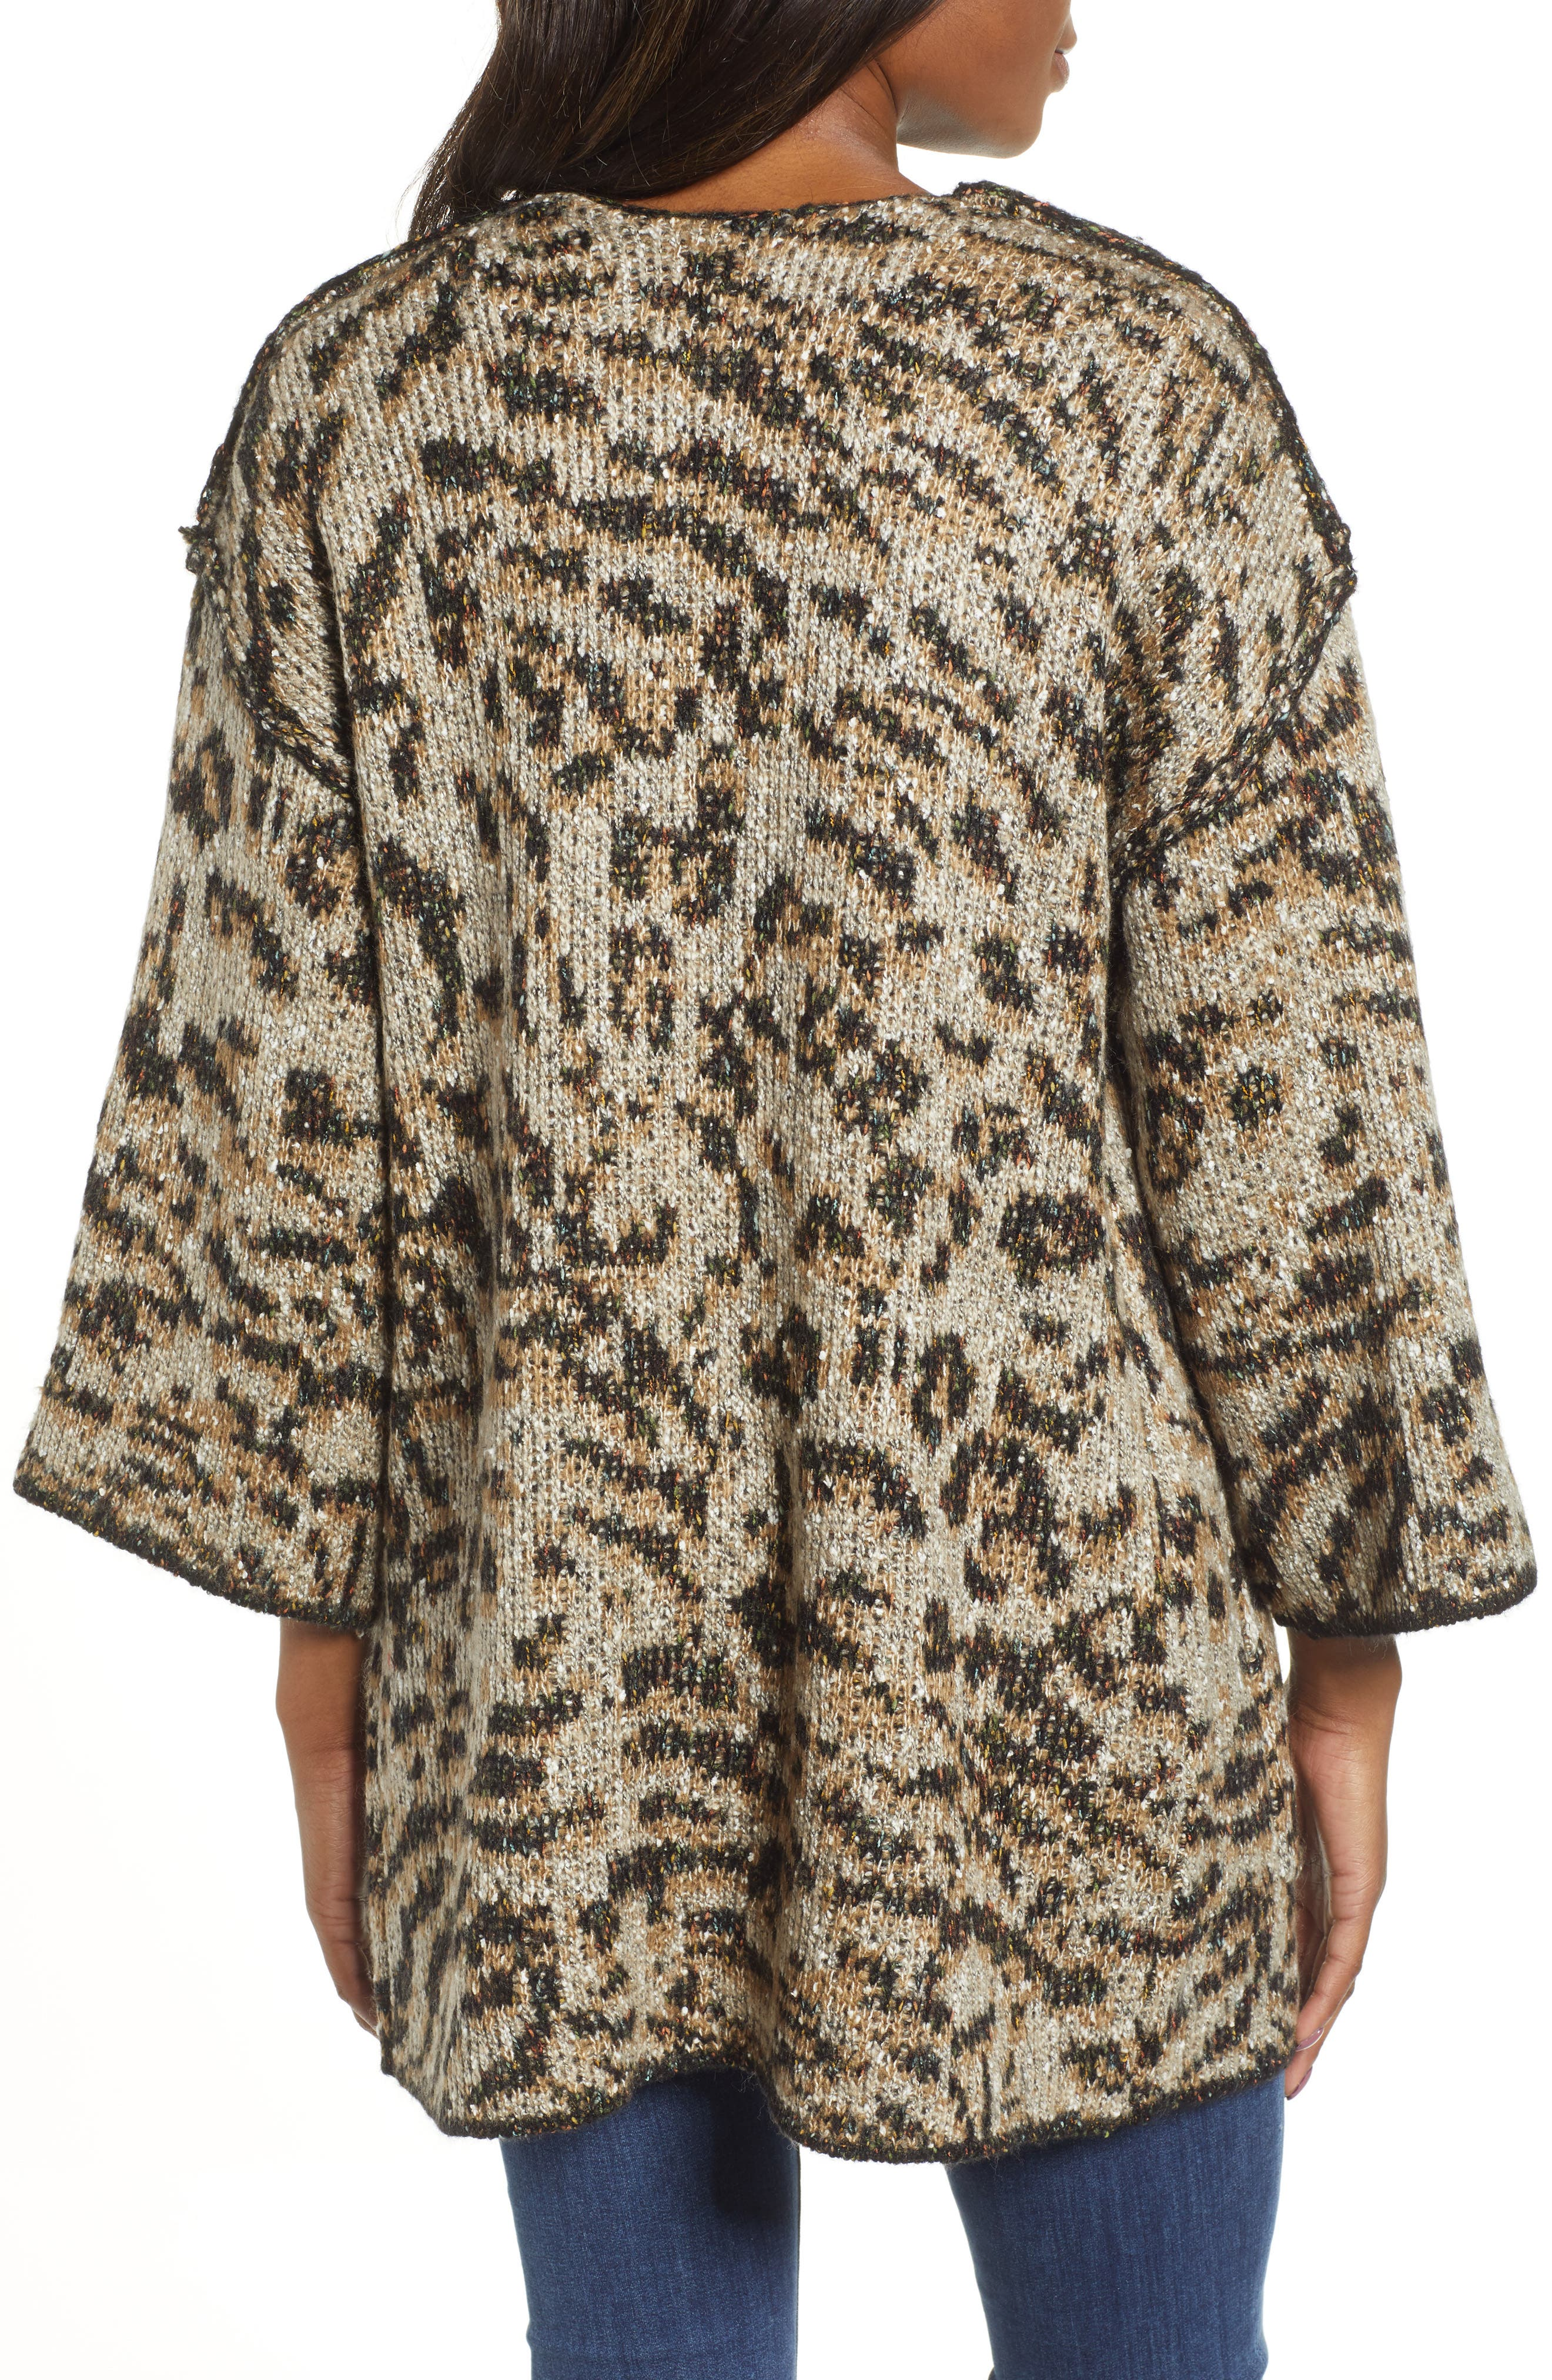 WIT & WISDOM,                             Reversible Tiger Jacquard Sweater Jacket,                             Alternate thumbnail 3, color,                             TAUPE